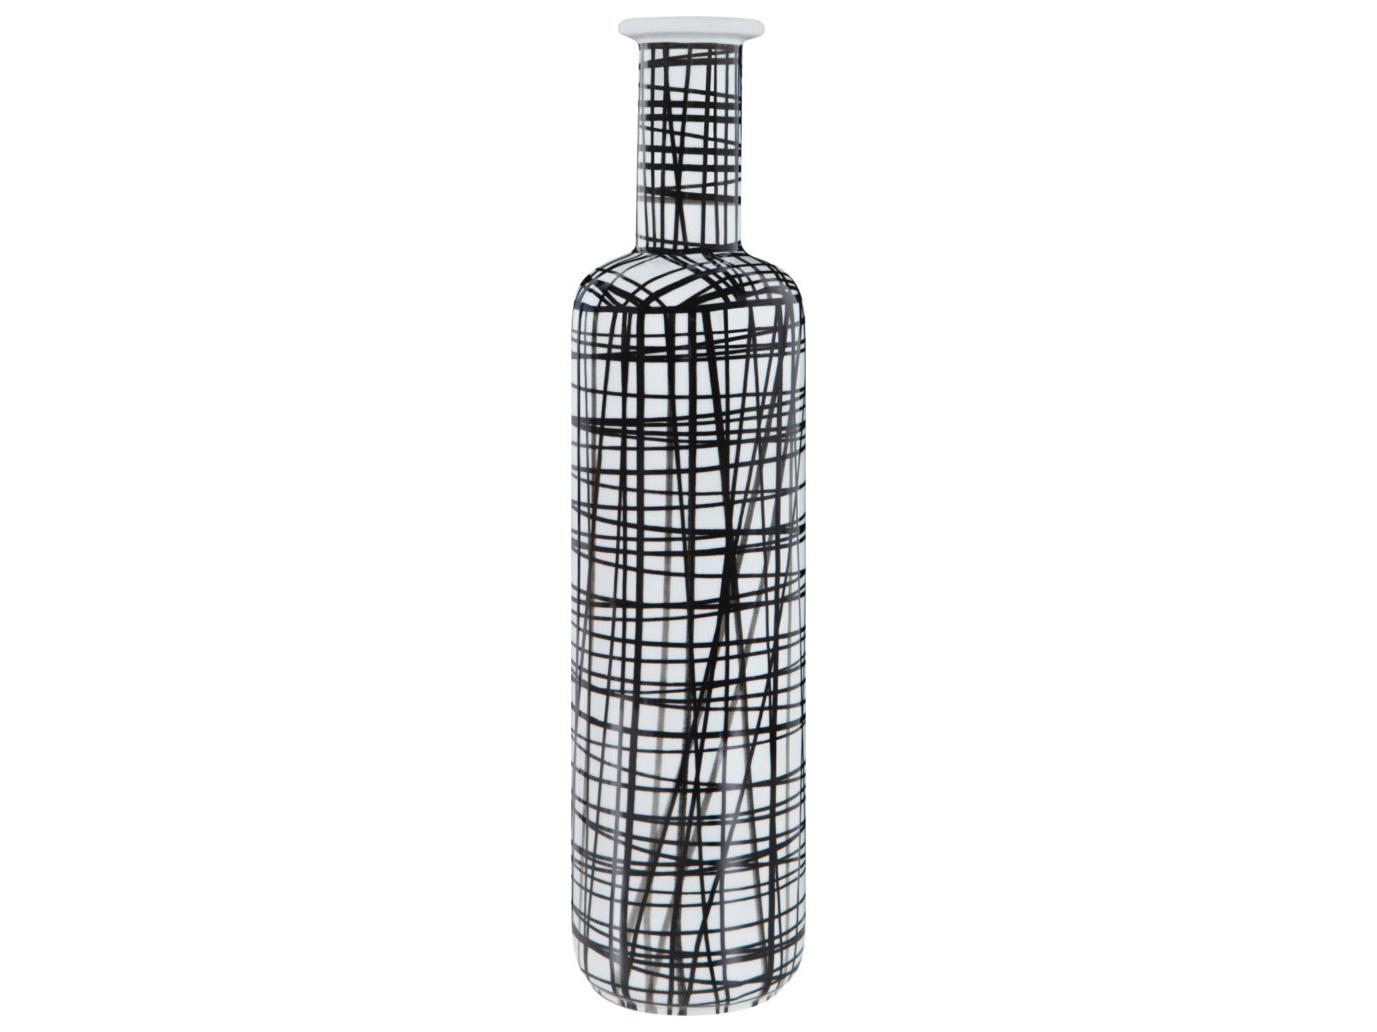 Декоративная ваза M-Style 15436441 от thefurnish